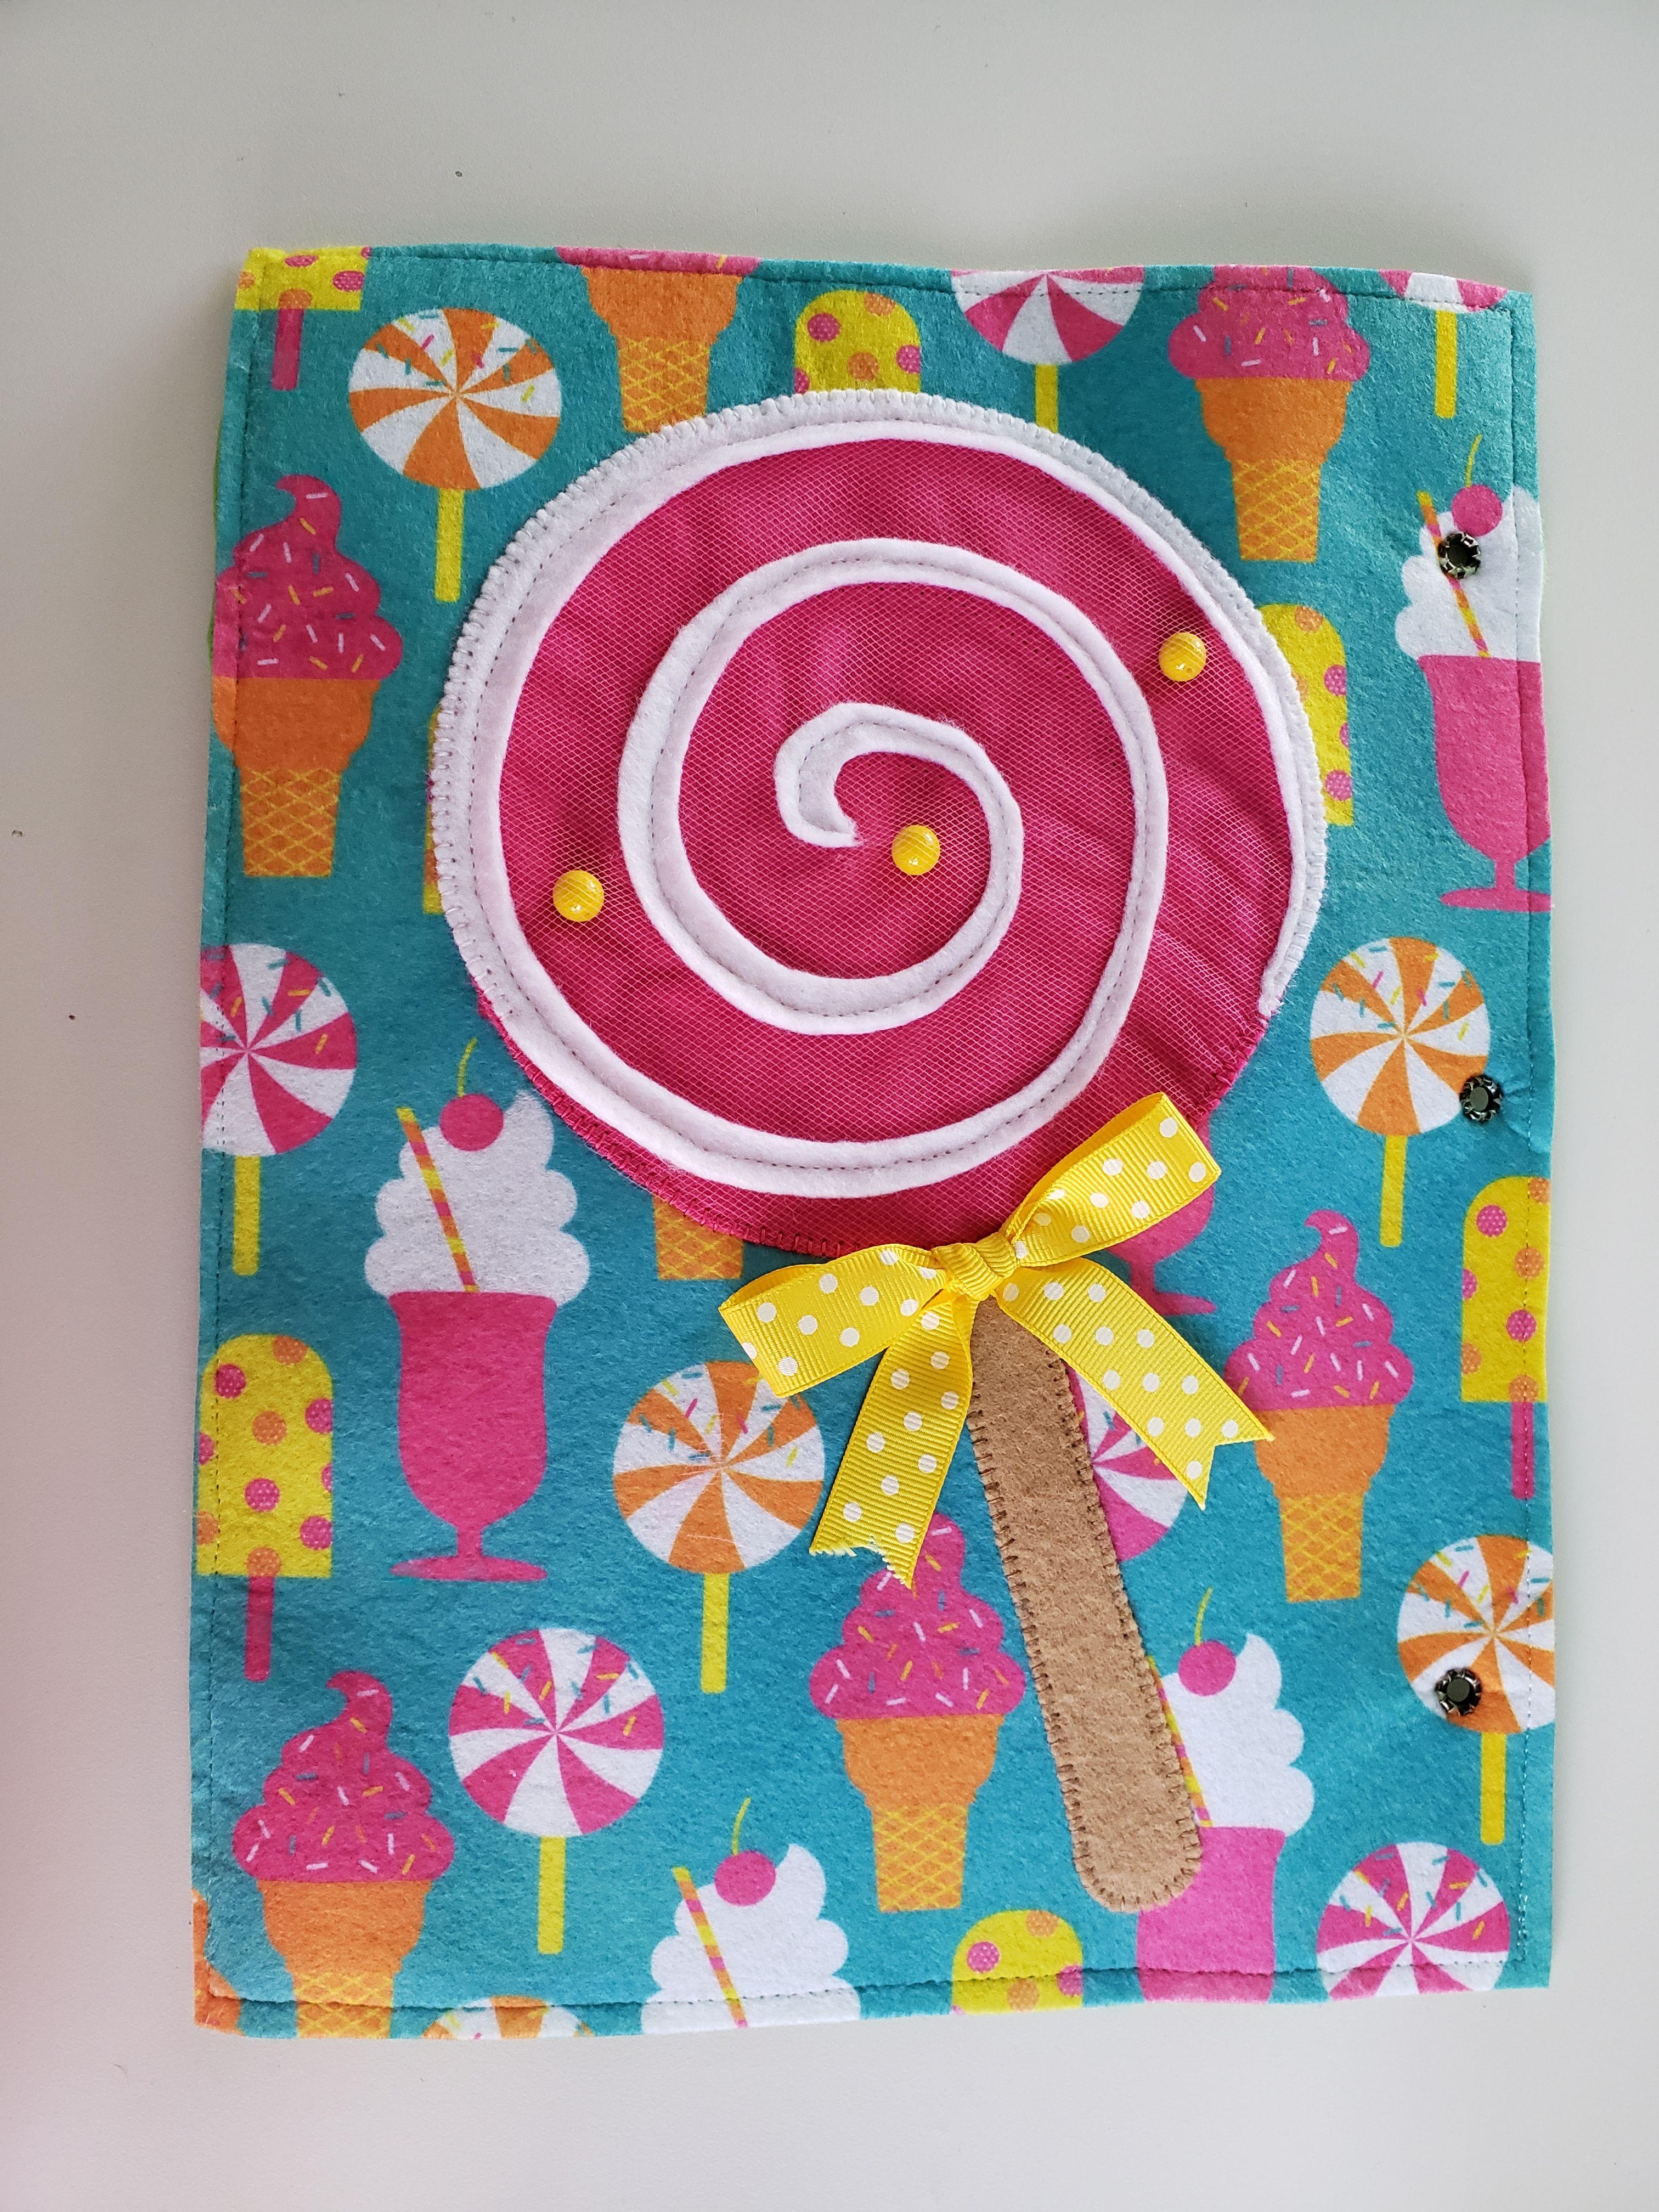 Lollipop Marble Maze Page